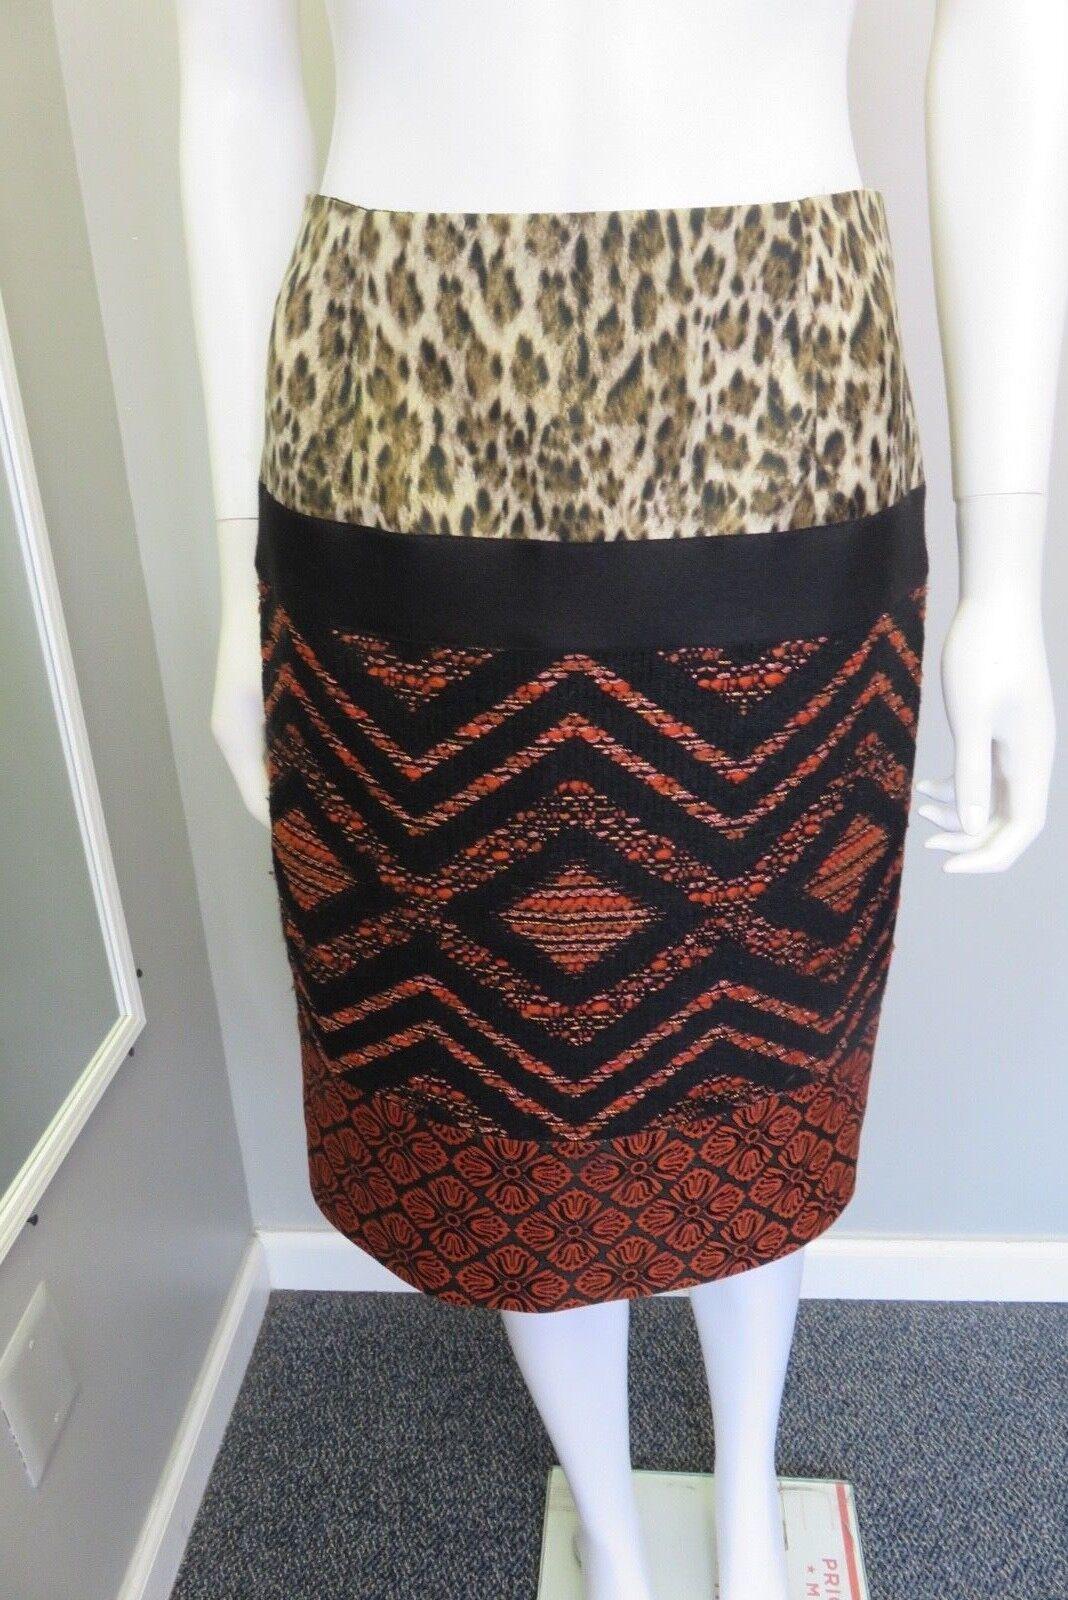 Giambattista valli skirt Sz 2 animal print top tweed in the middle and broacade